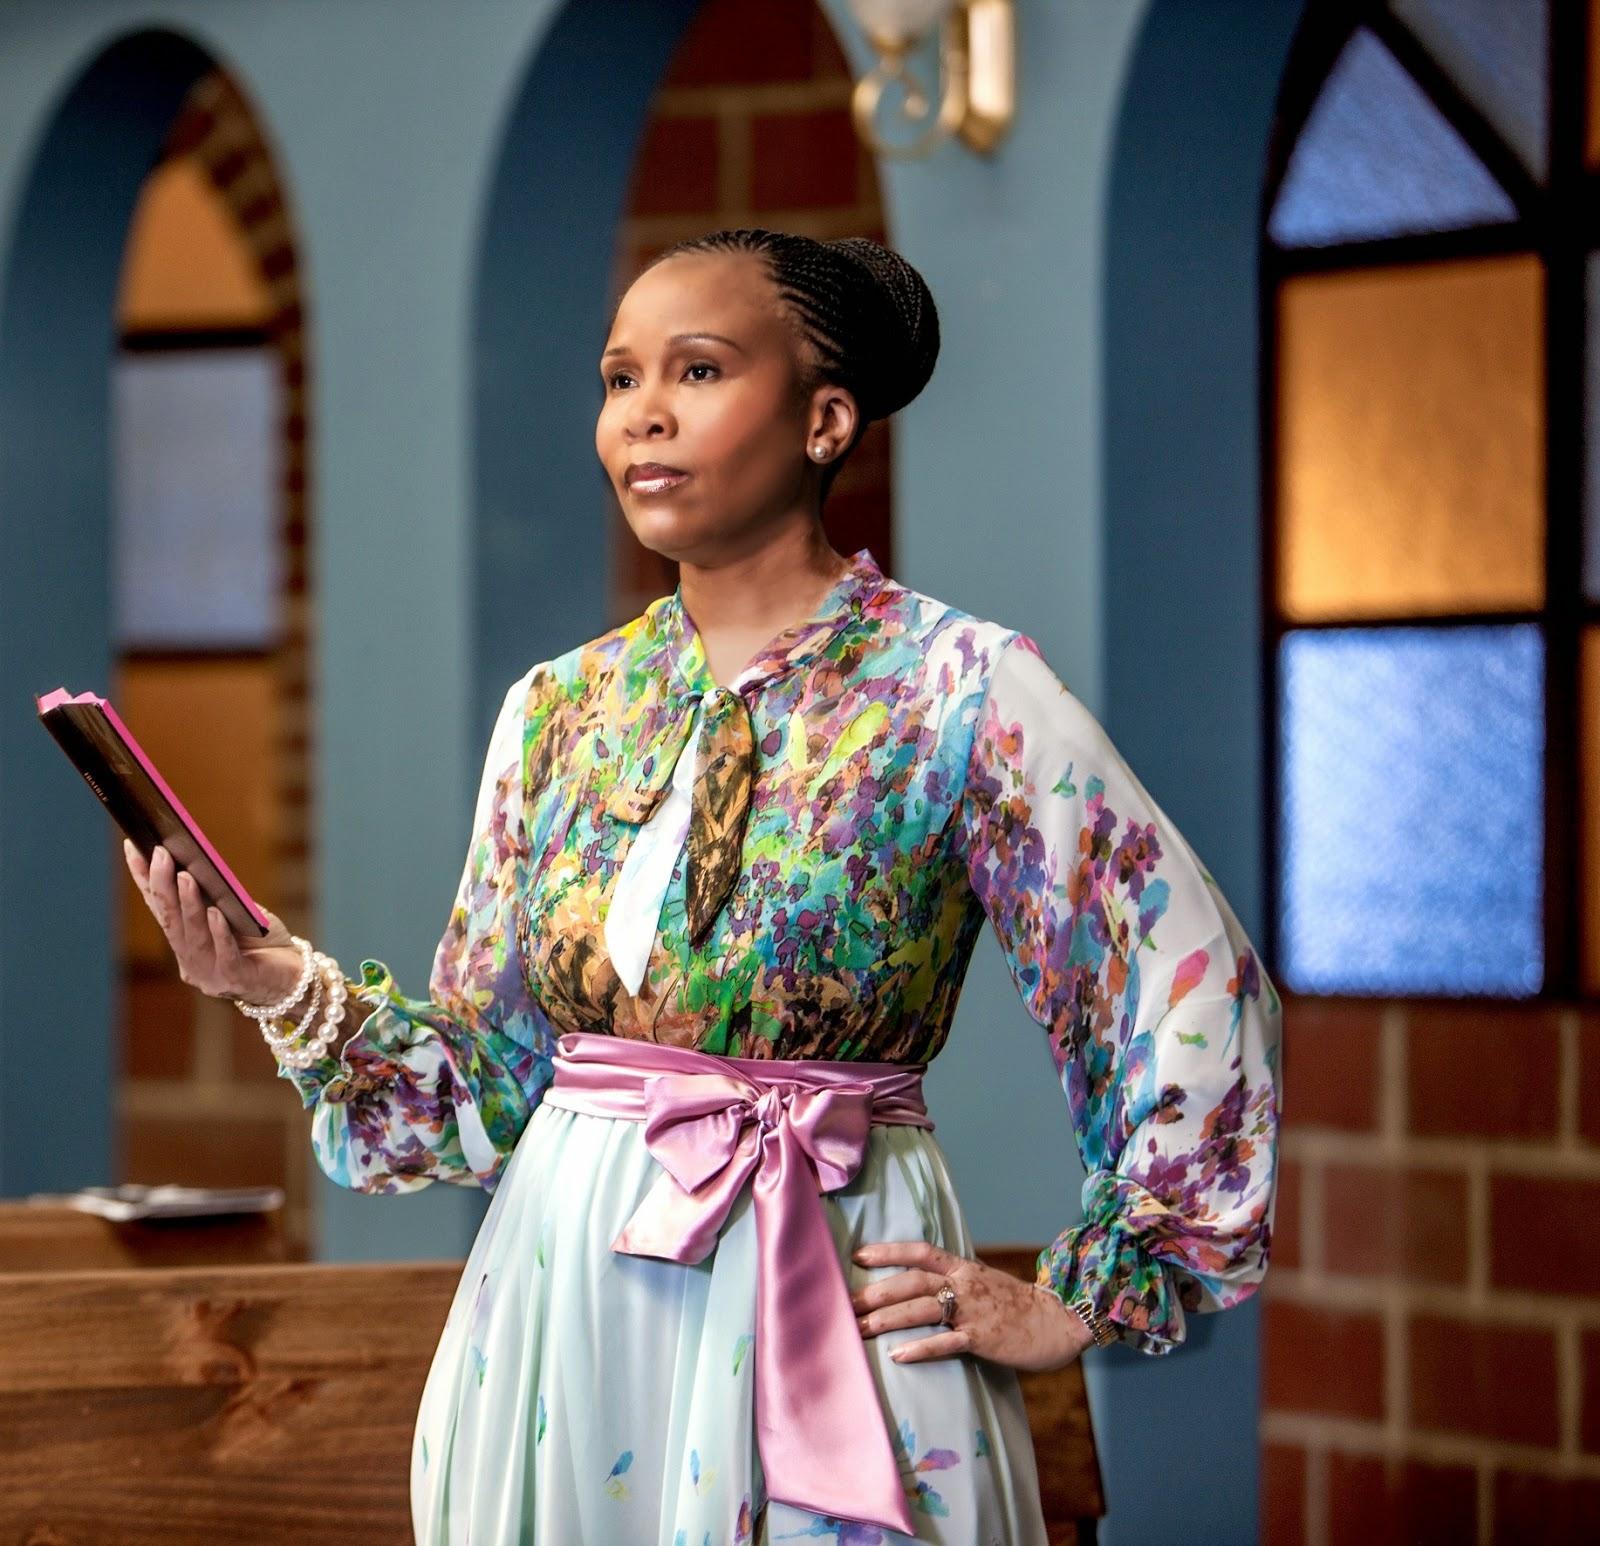 Former Uzalo actress Thandeka Zulu enjoyed her baby shower with loved ones